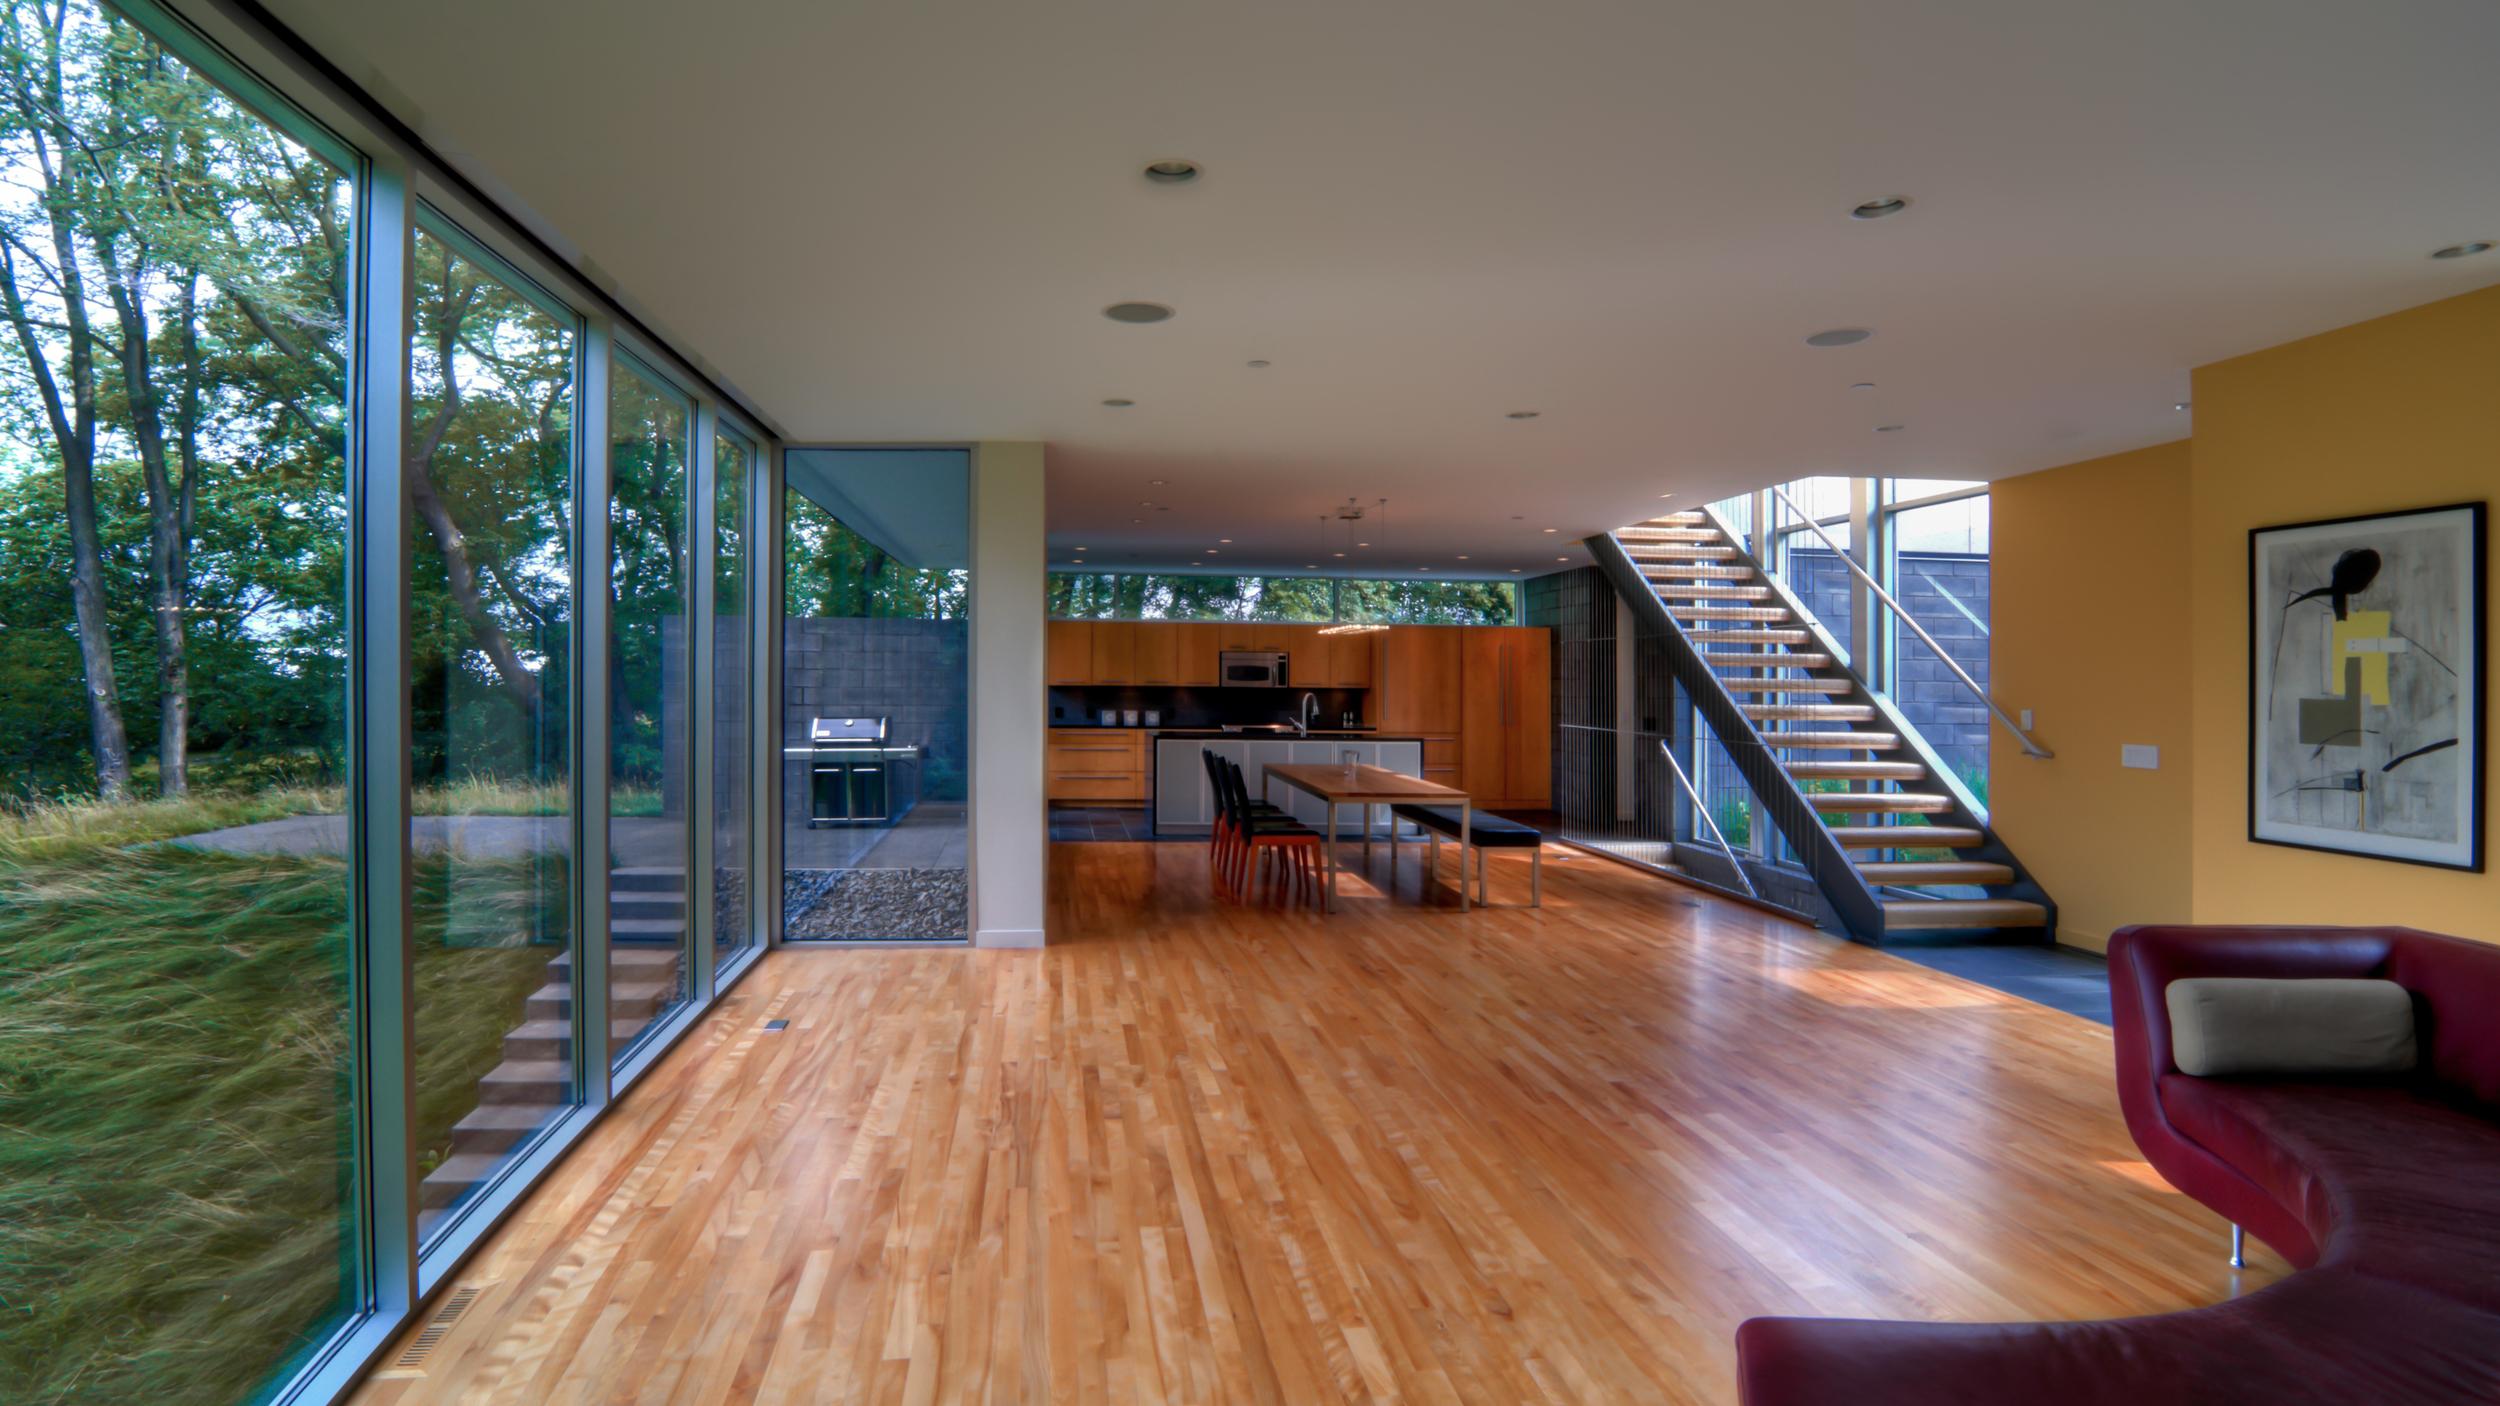 Altus Architecture +Design: Minnetonka Residence - Living Space